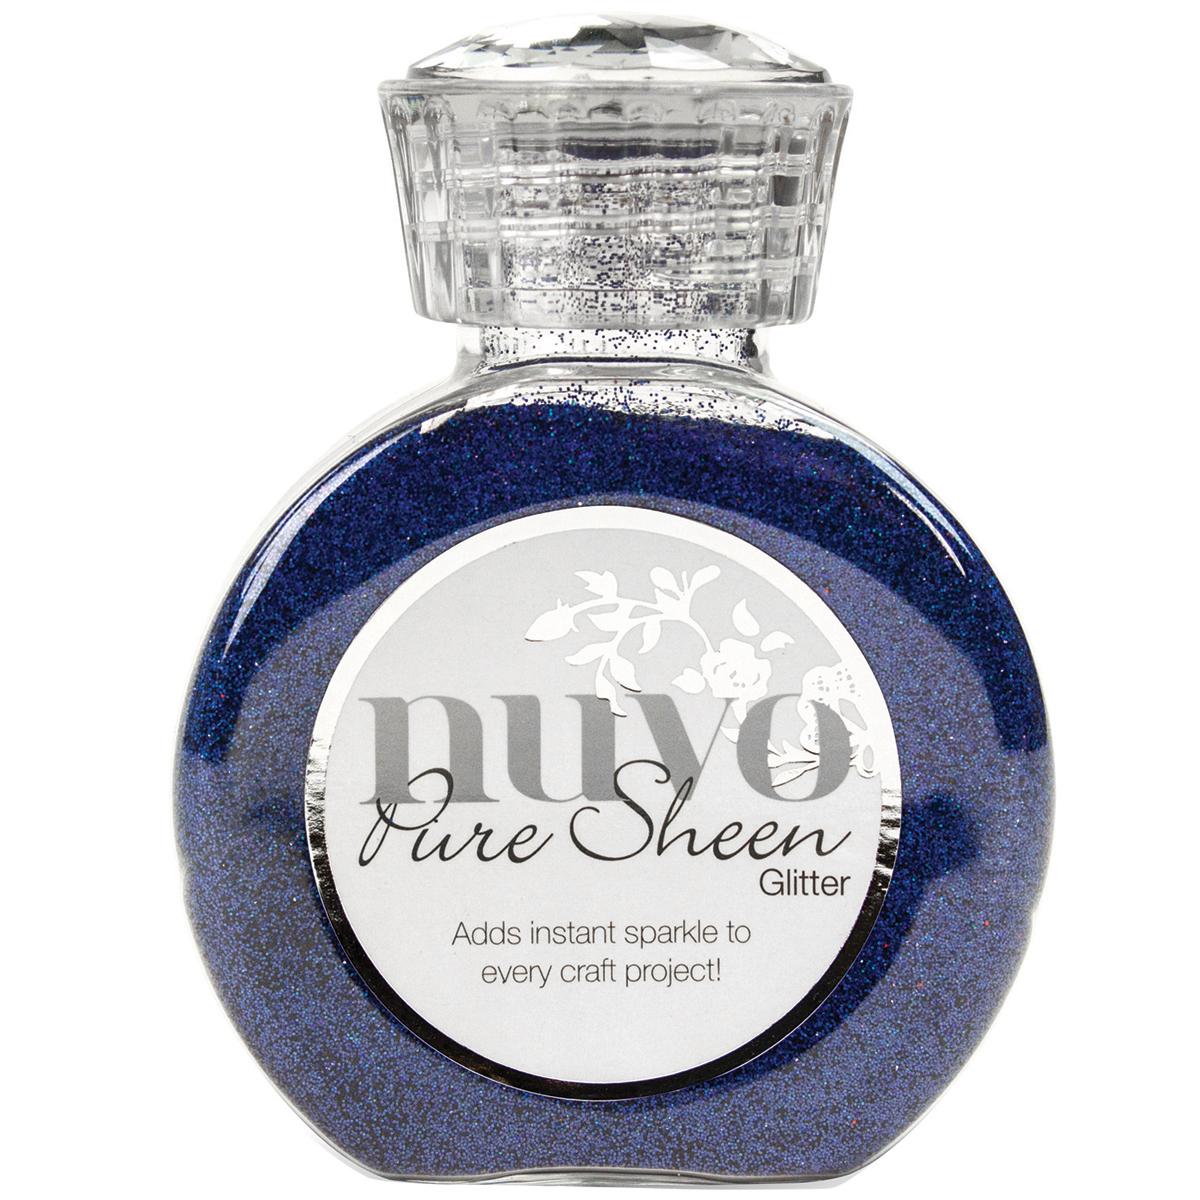 Nuvo Pure Sheen Glitter 3.38oz-Blue Sapphire